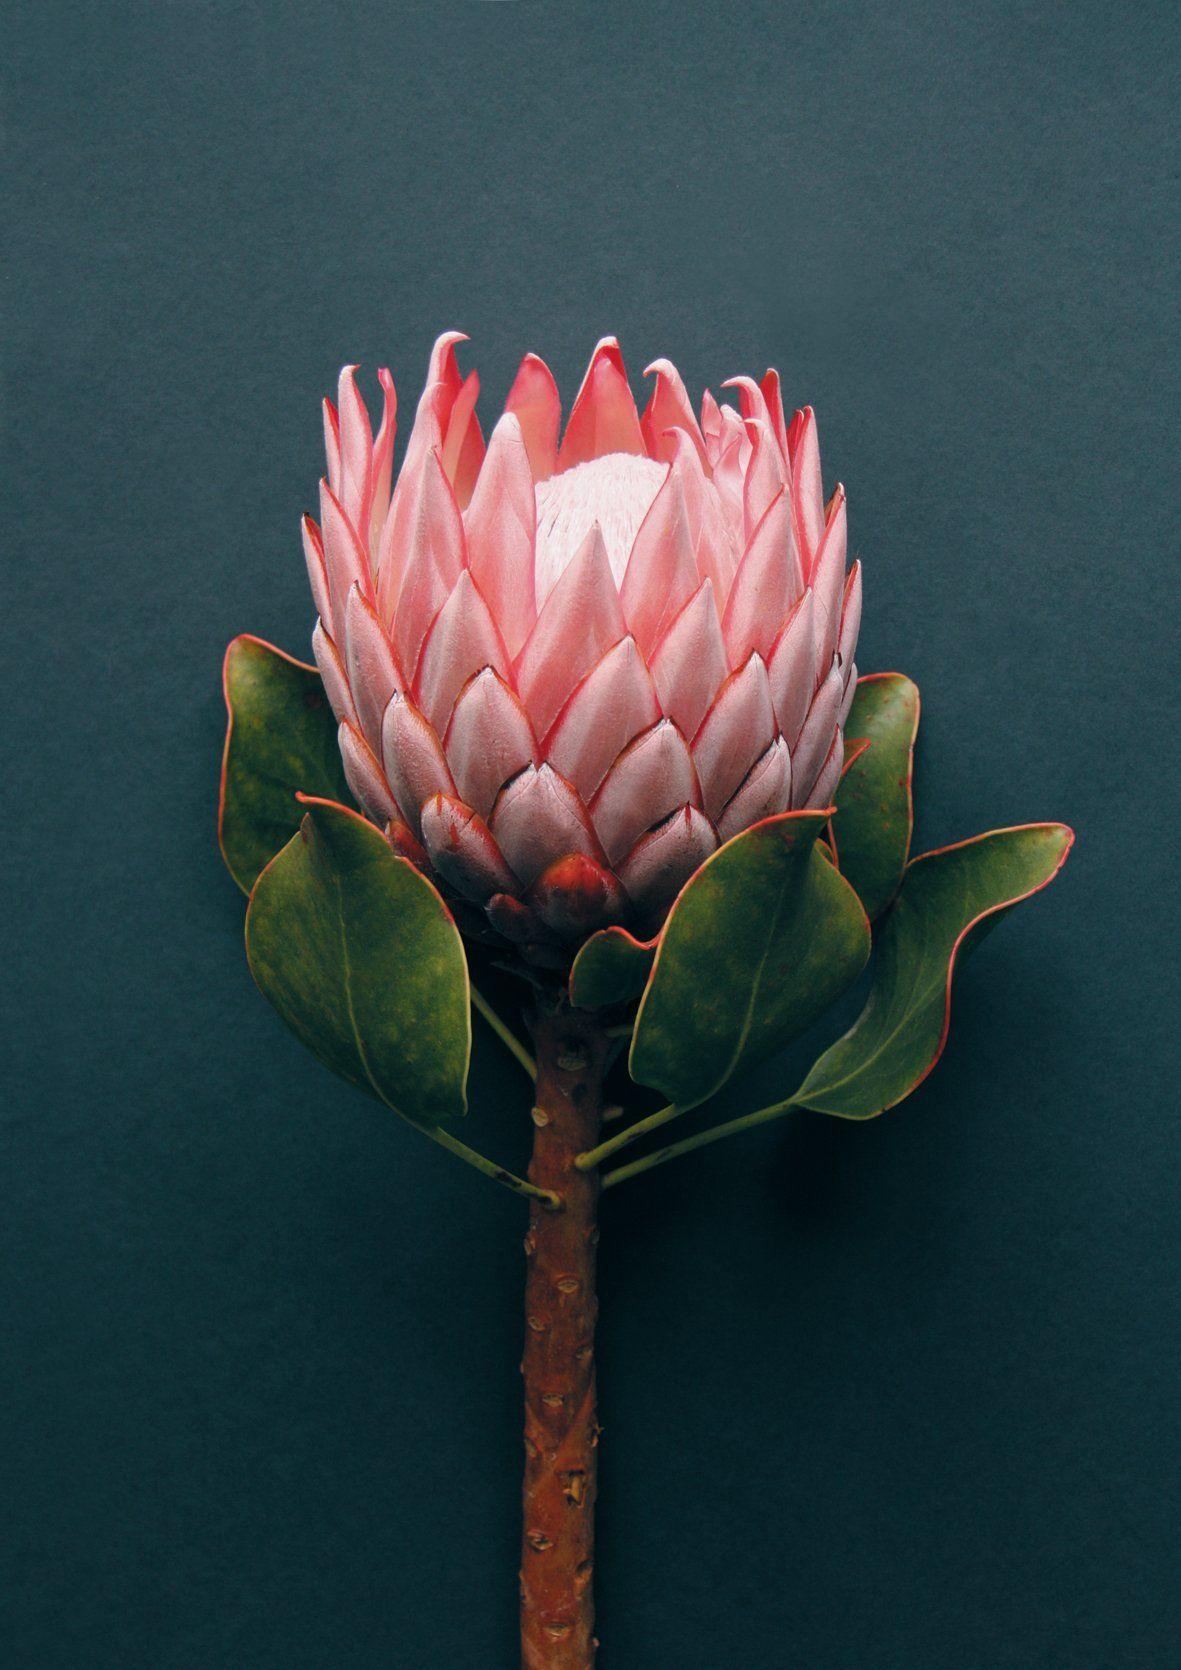 Pin By Djunnamed On Inspired Protea Flower Protea Art Flower Art